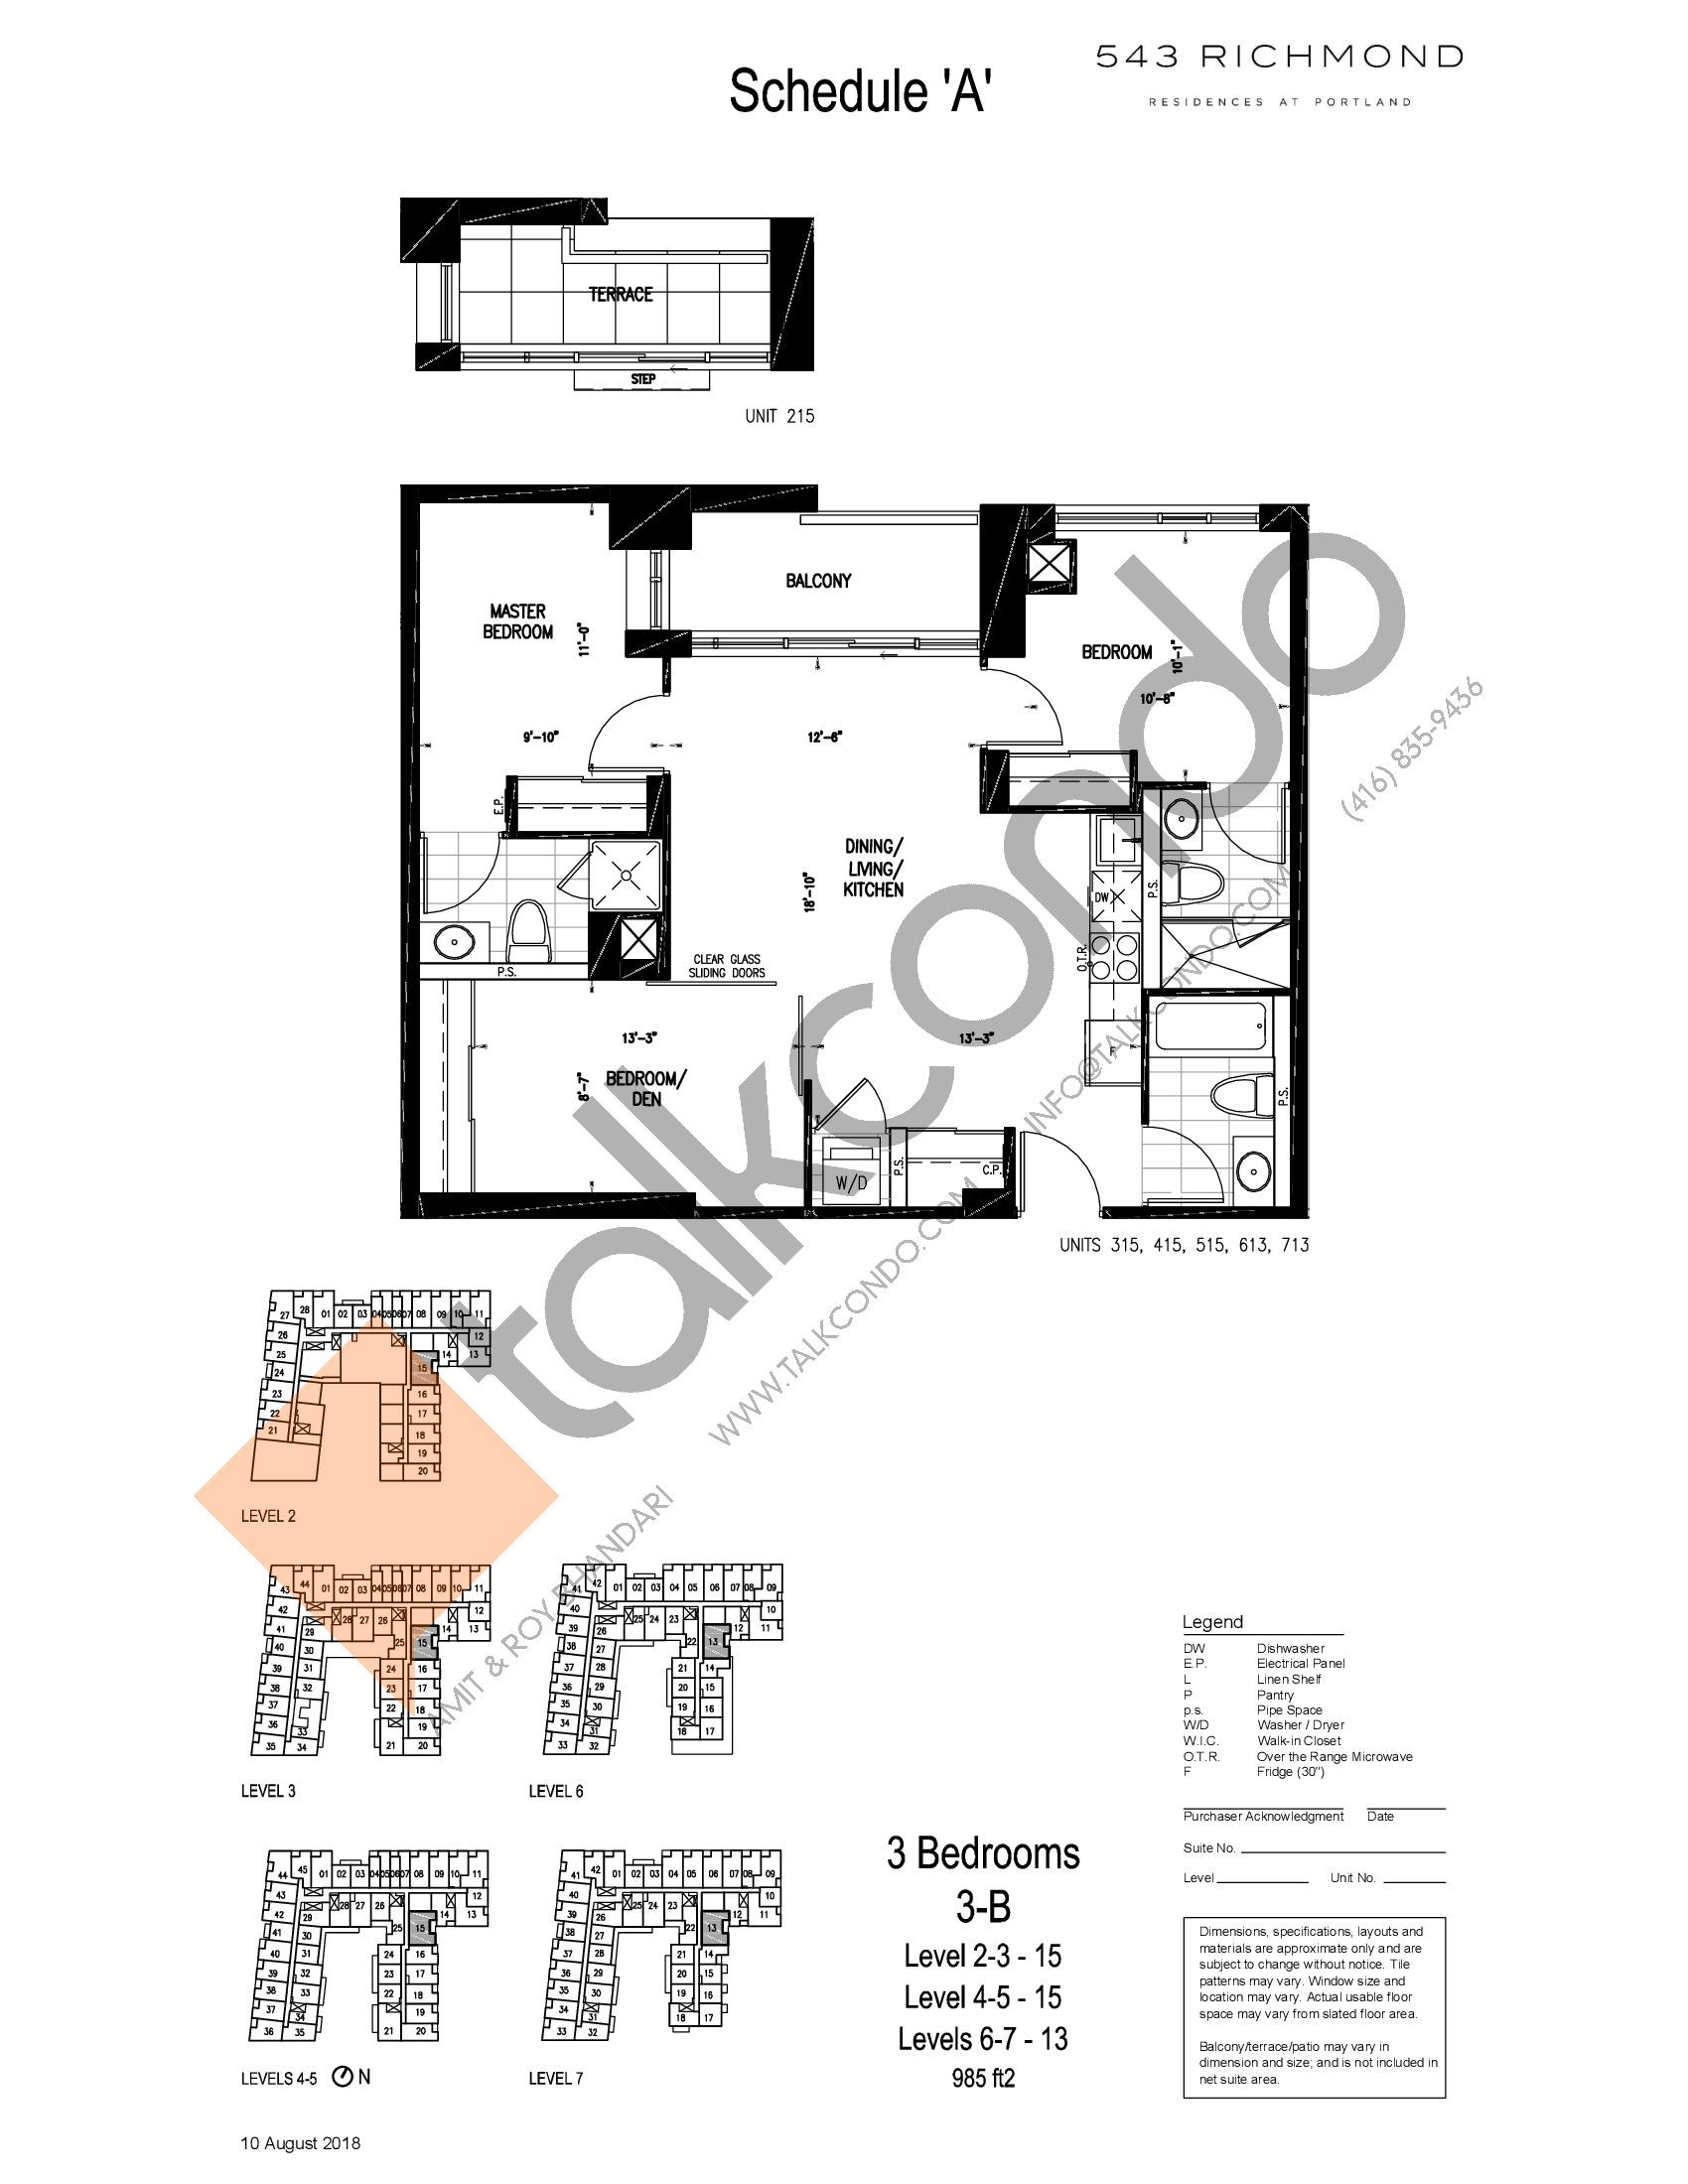 3-B Floor Plan at 543 Richmond St Condos - 985 sq.ft